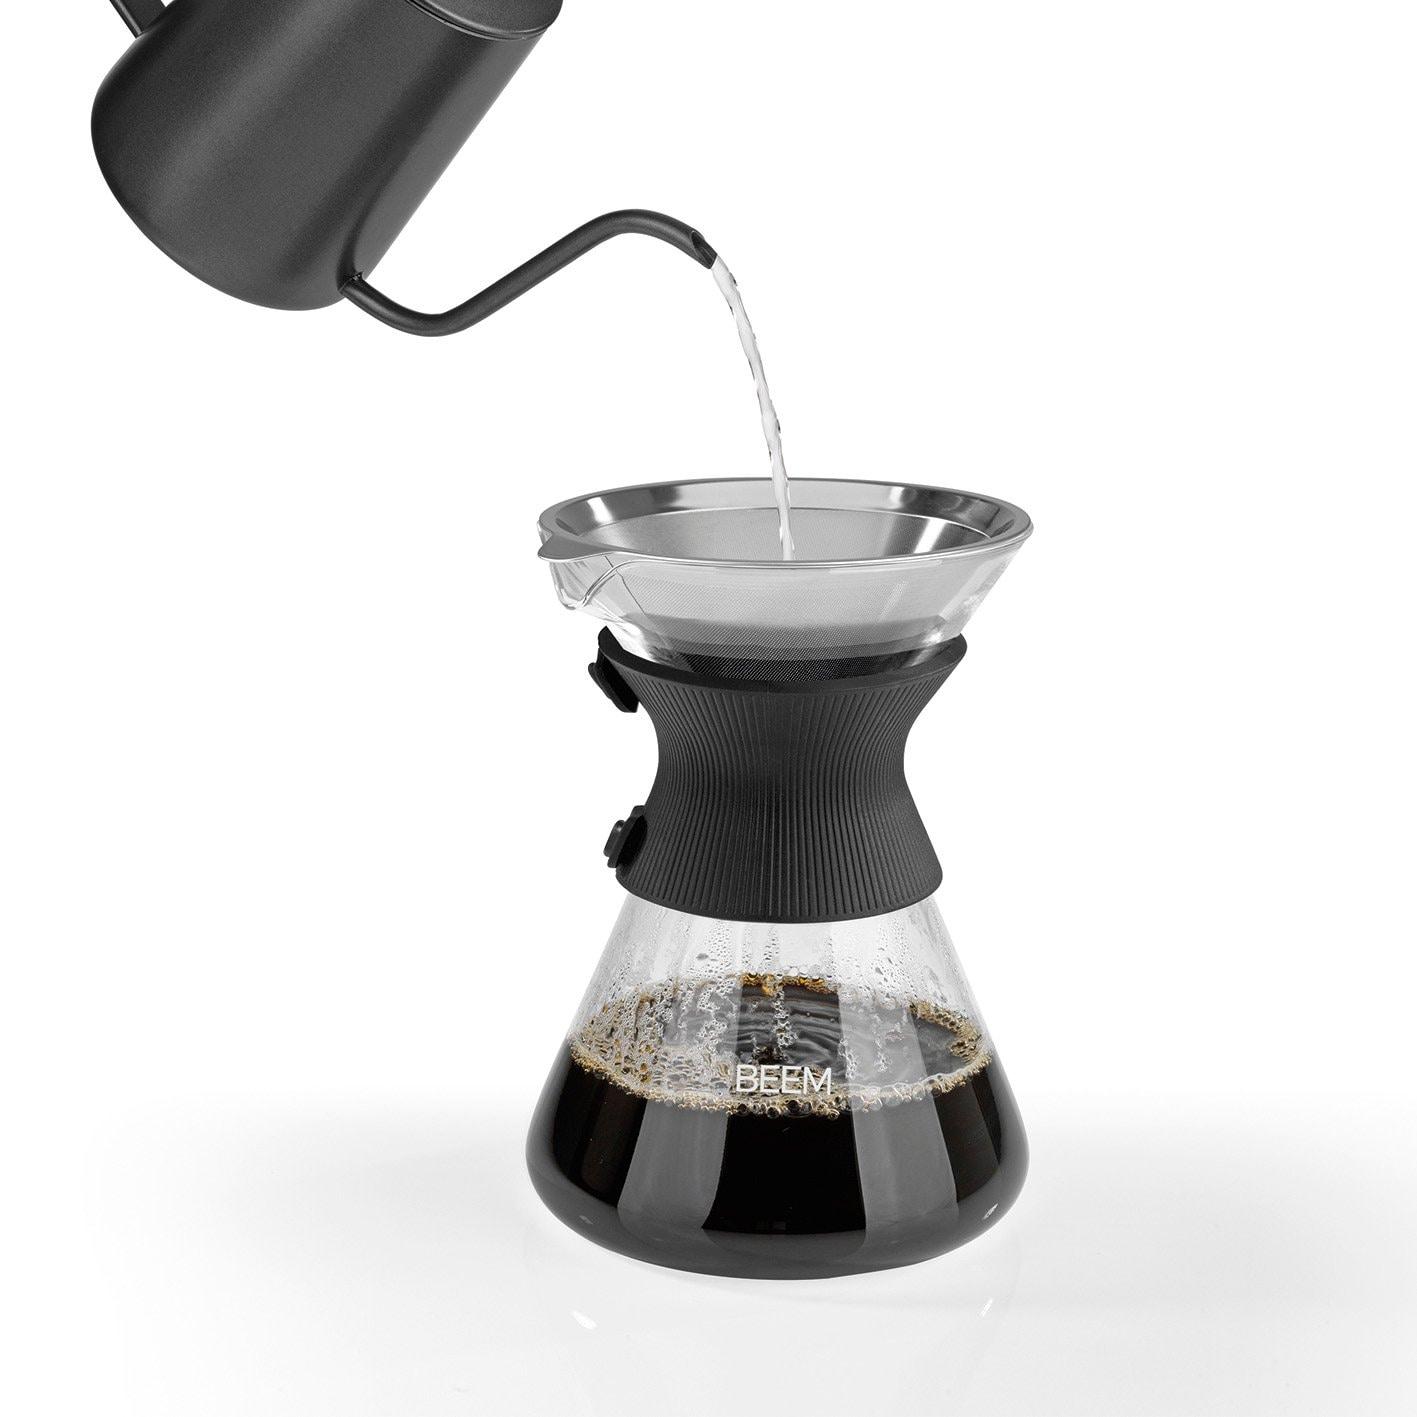 Beem Pour Over Kaffeekaraffe mit Permanentfilter - 6 Tassen, Classic Selection, 3-teilig